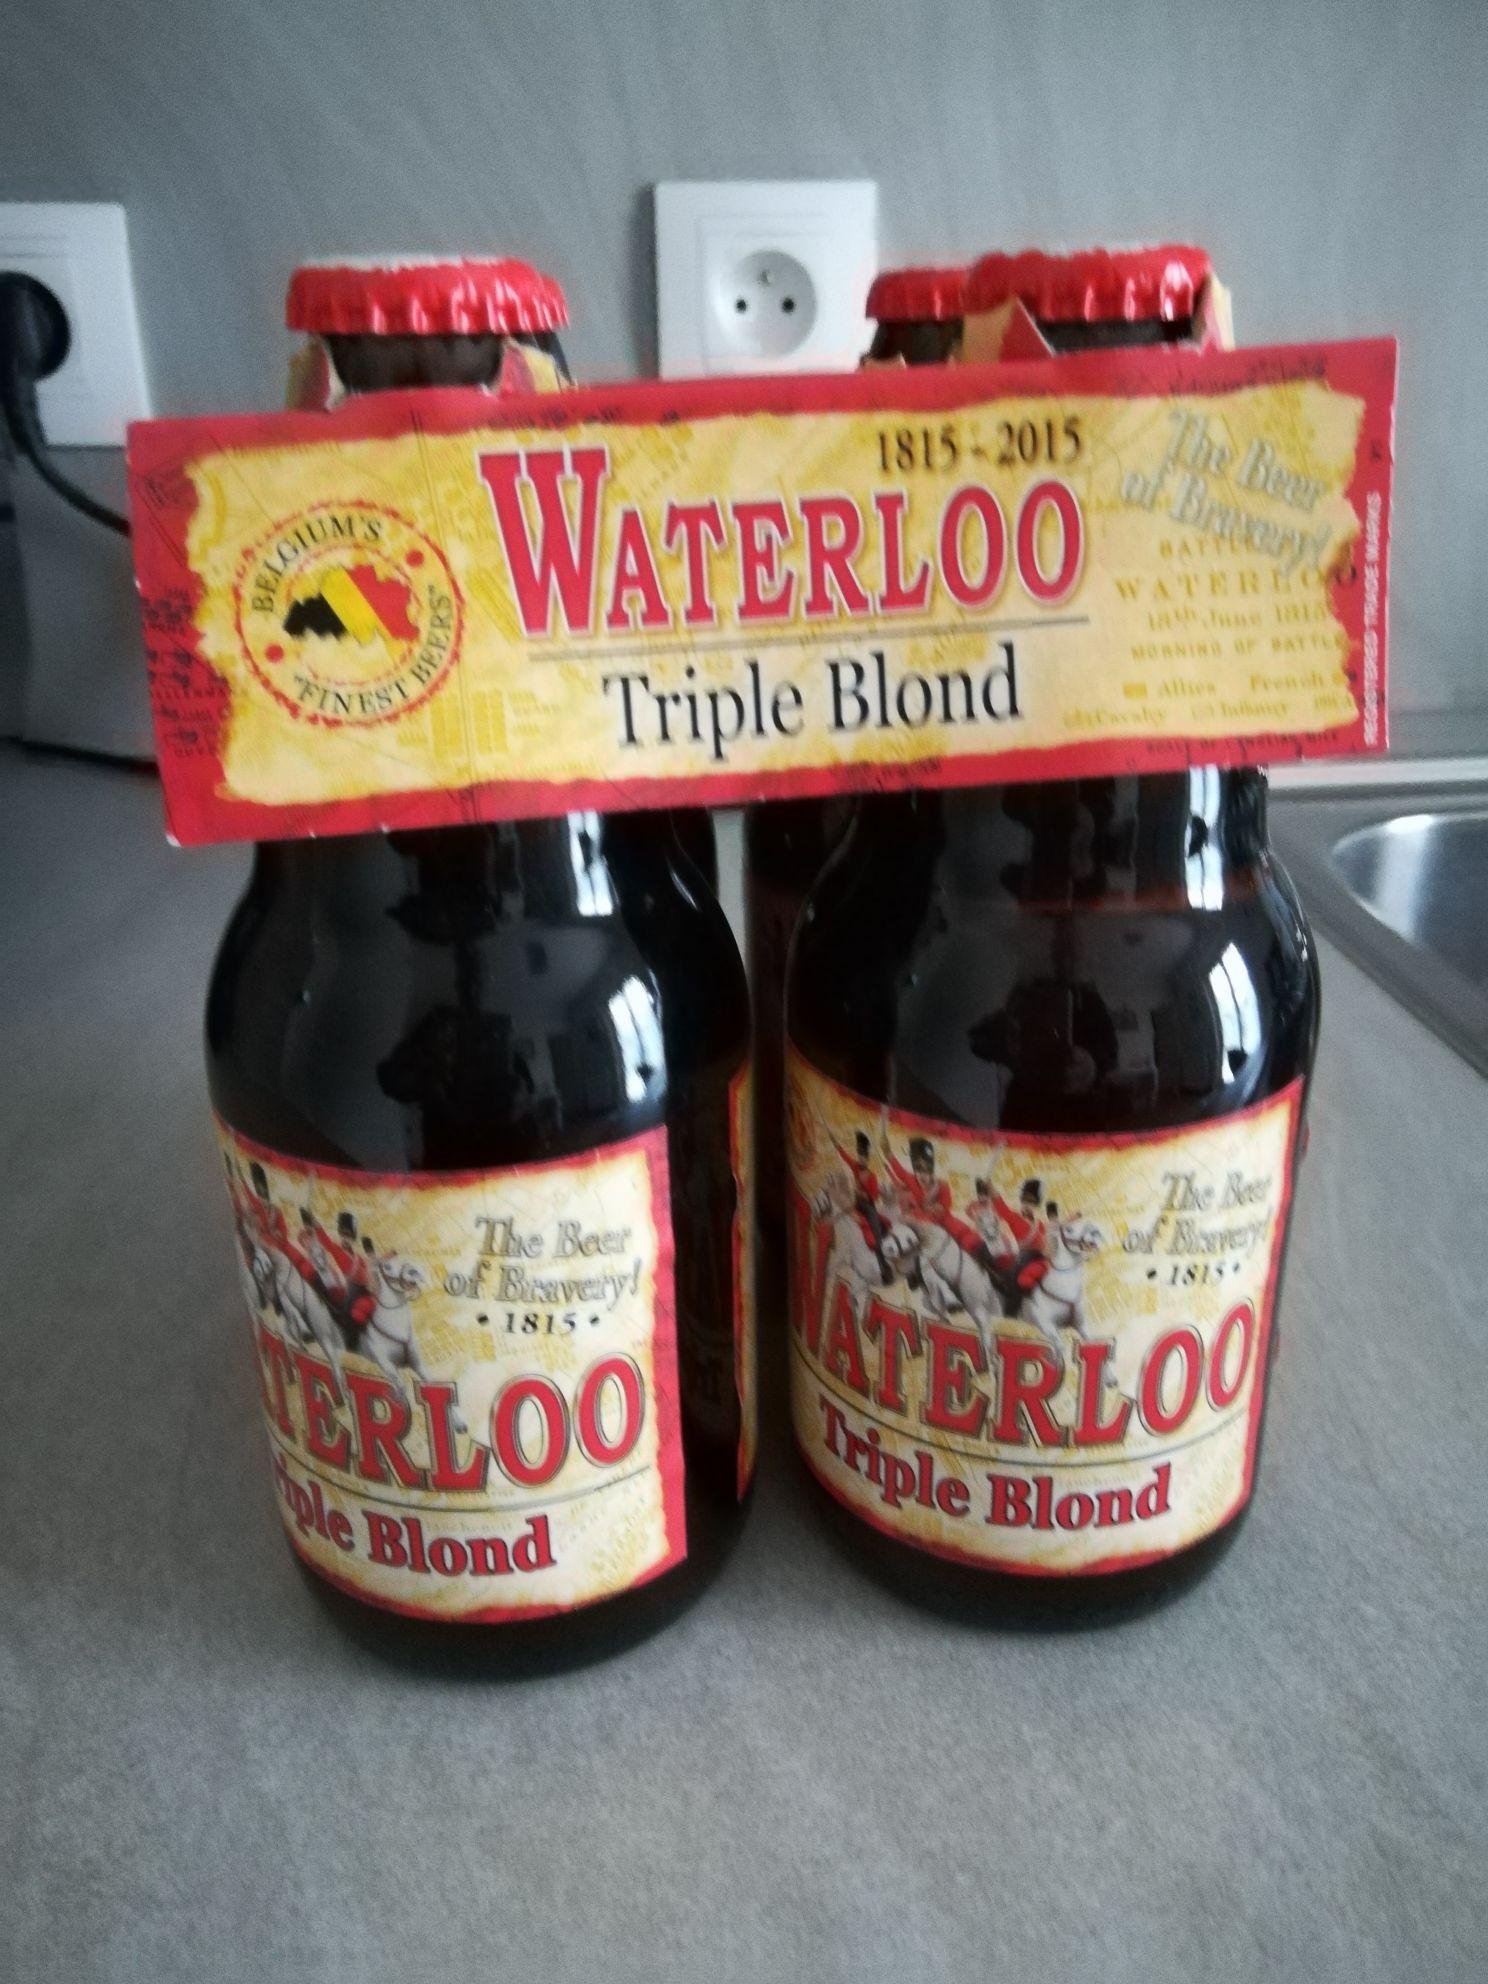 Bière triple blonde Waterloo - 4 x 33 cl - Marolles-en-Hurepoix (91)